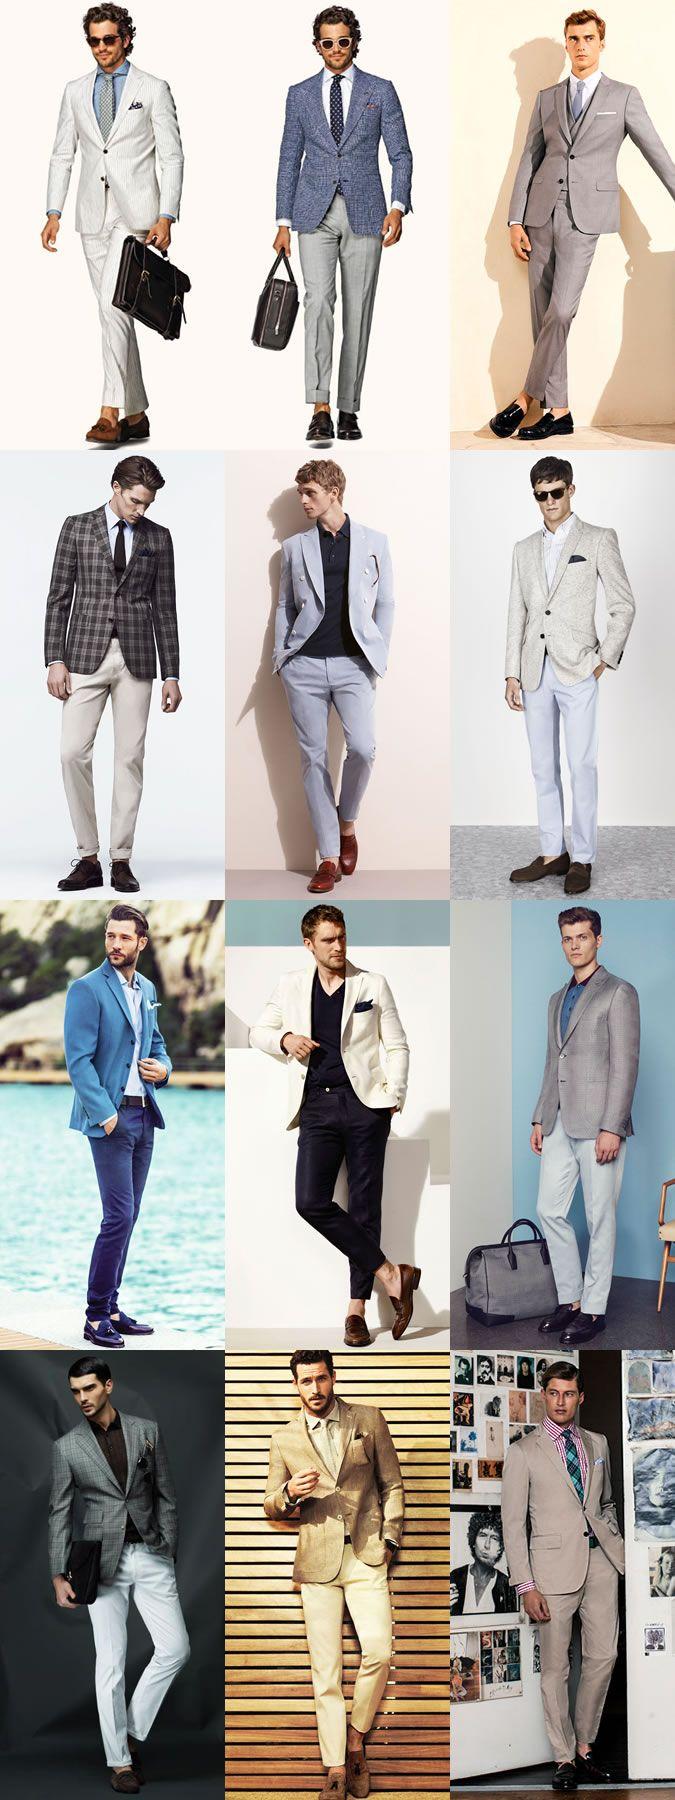 Men's Summer Business Wardrobe Updates: Formal with Summer Colour Lookbook Inspiration